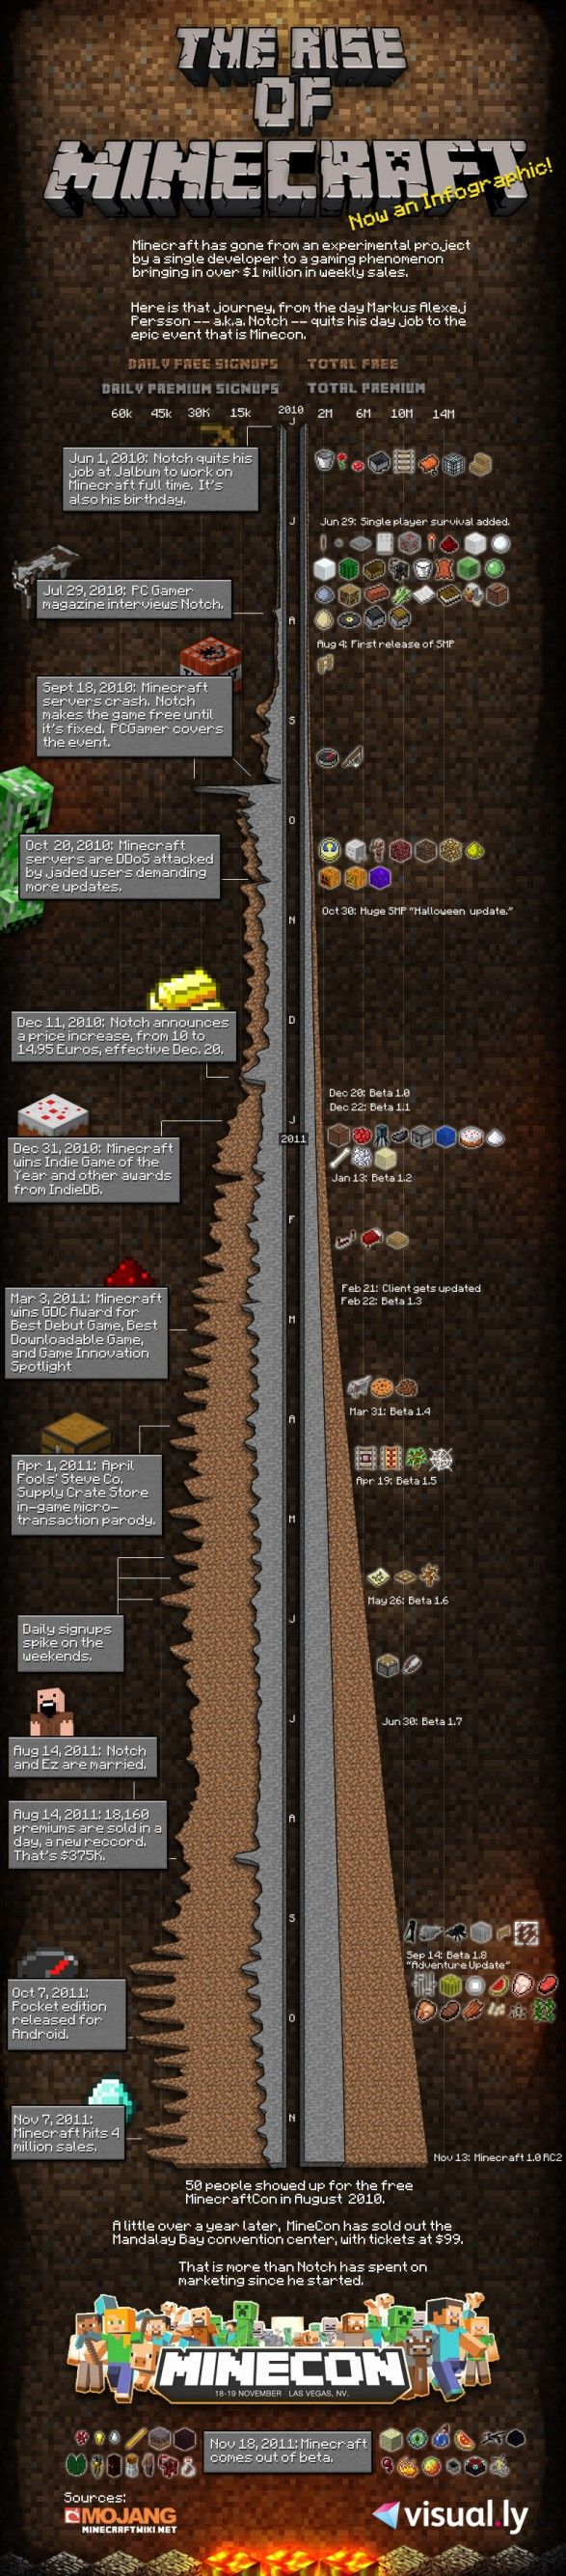 Yay Minecraft!